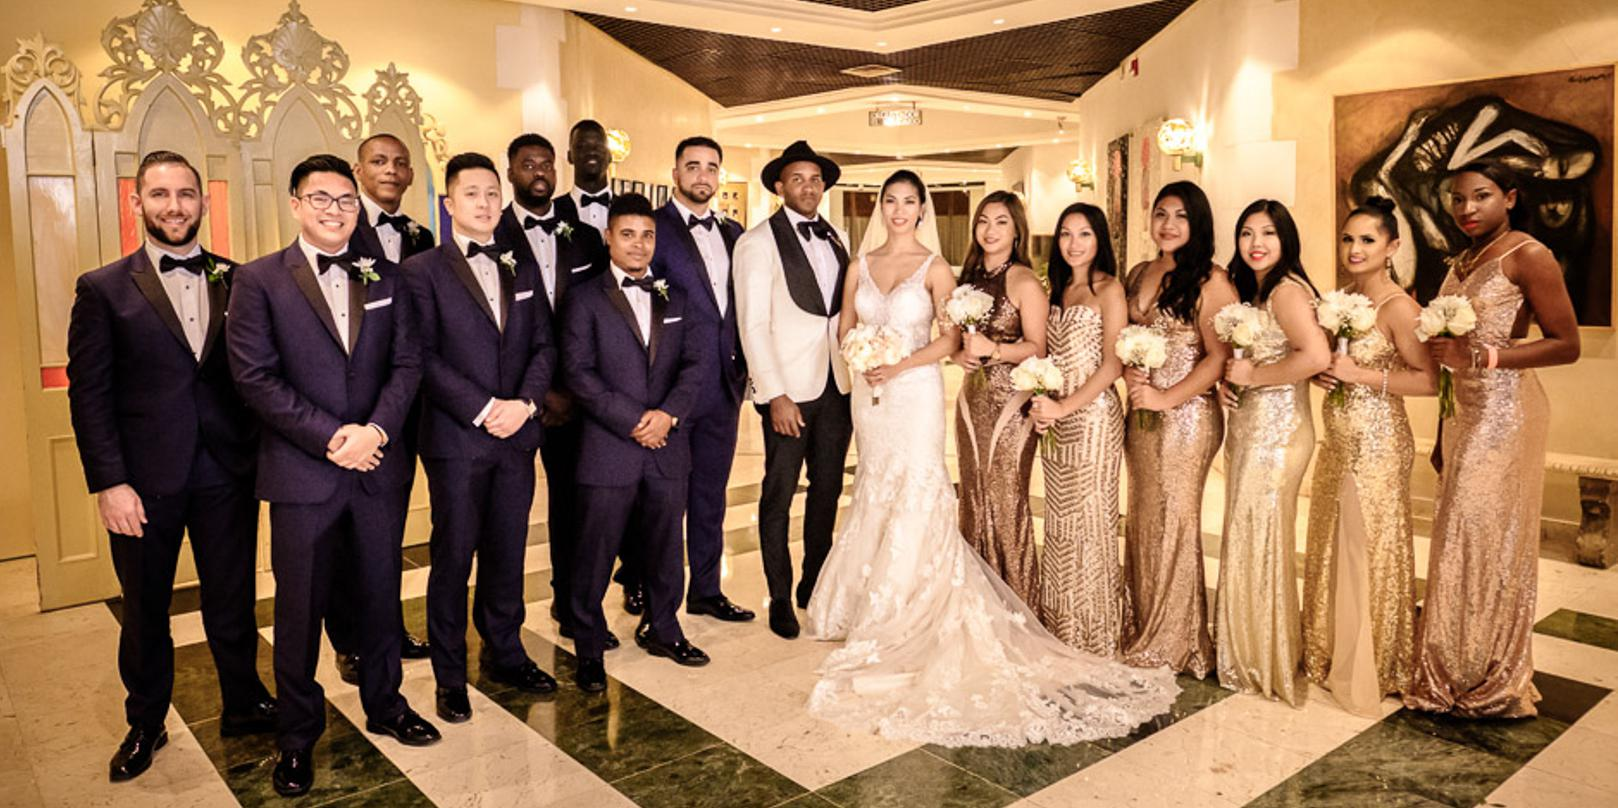 bodas-sin-clasificar-sin-tema-cuba-41421.jpg